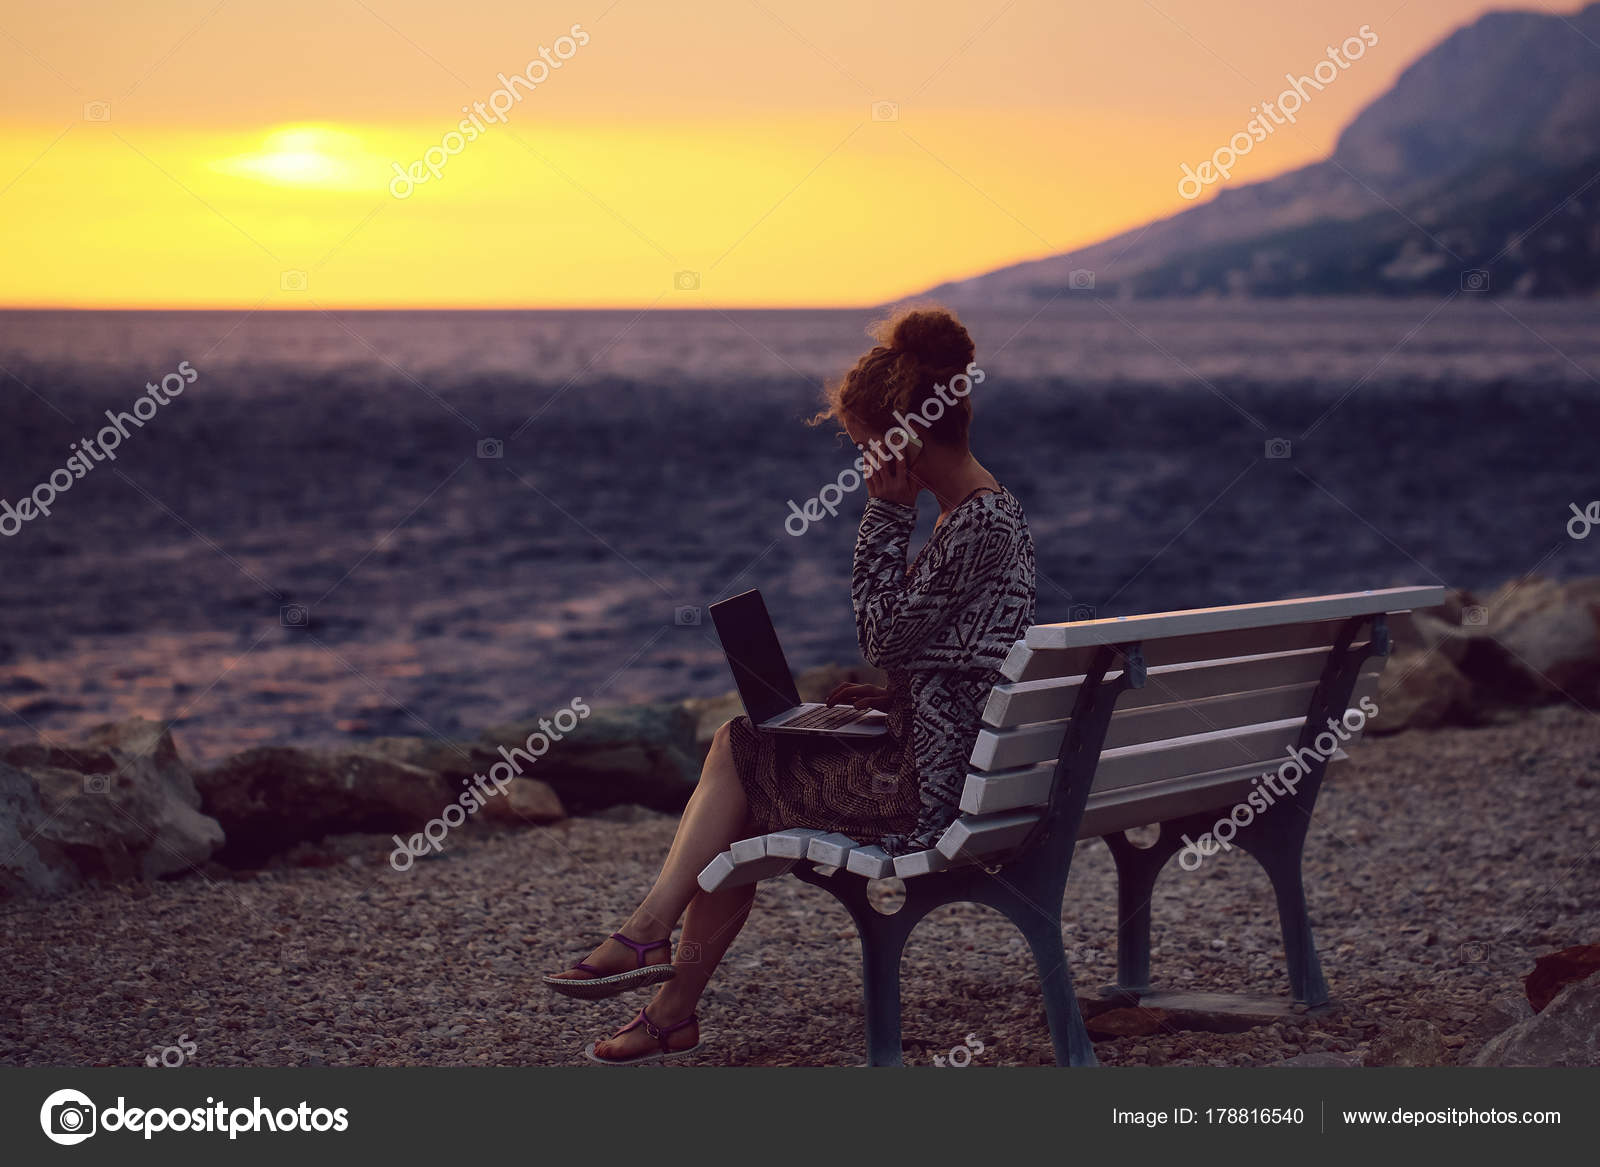 7719af032d90 Frau mit Laptop am Strand am Abend — Stockfoto © Tverdohlib.com ...